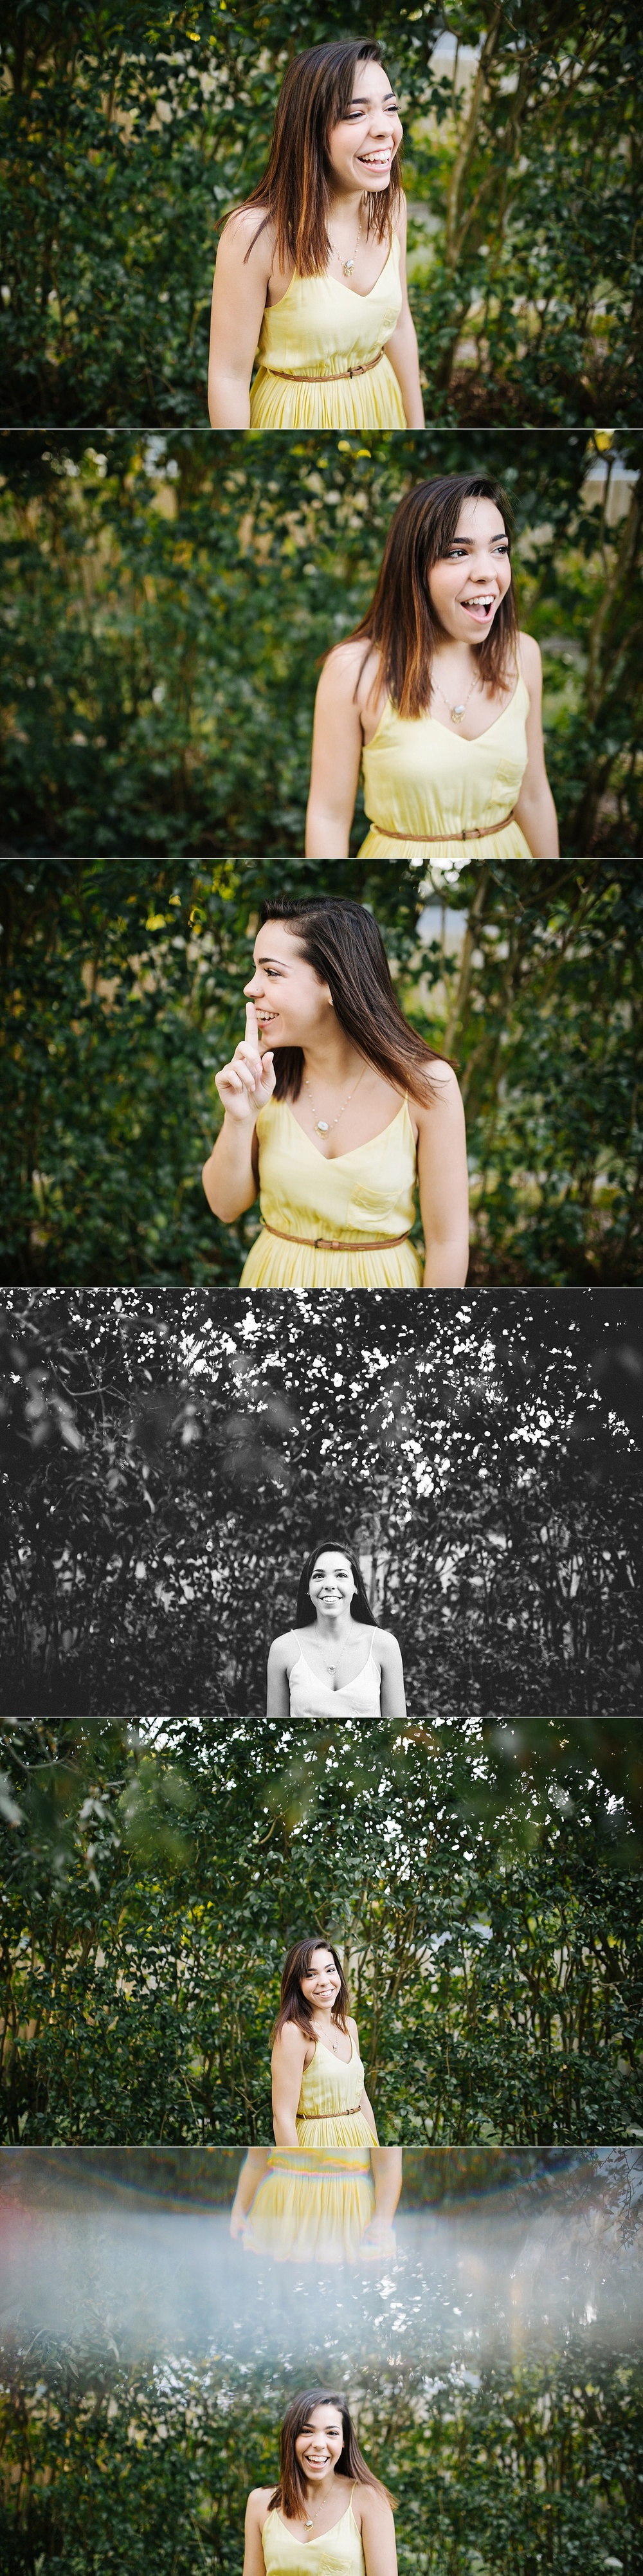 tampa hyde park senior portraits-10